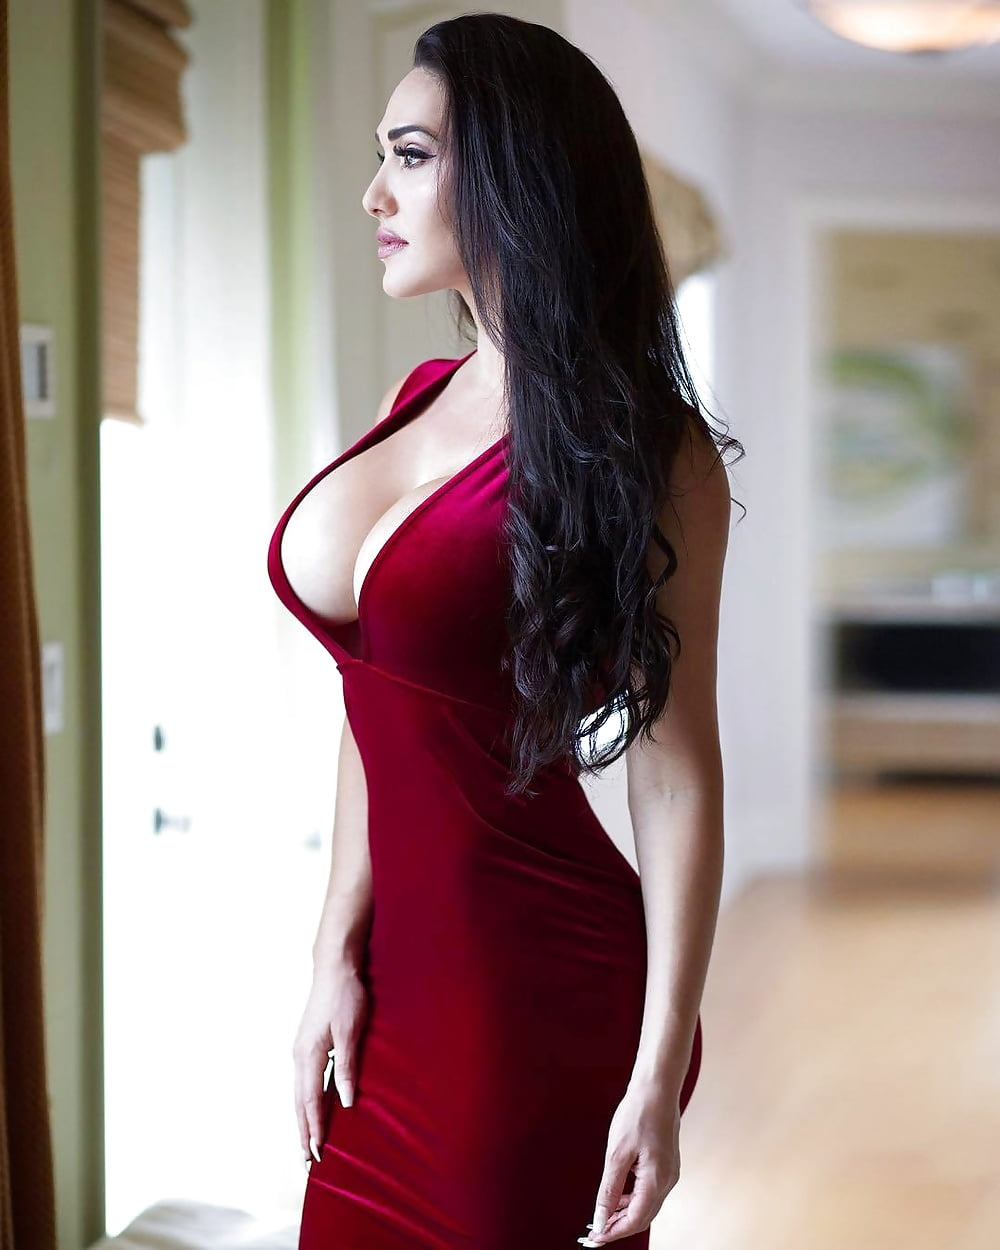 Sex big boobs in tight black dress hairiest pussy free